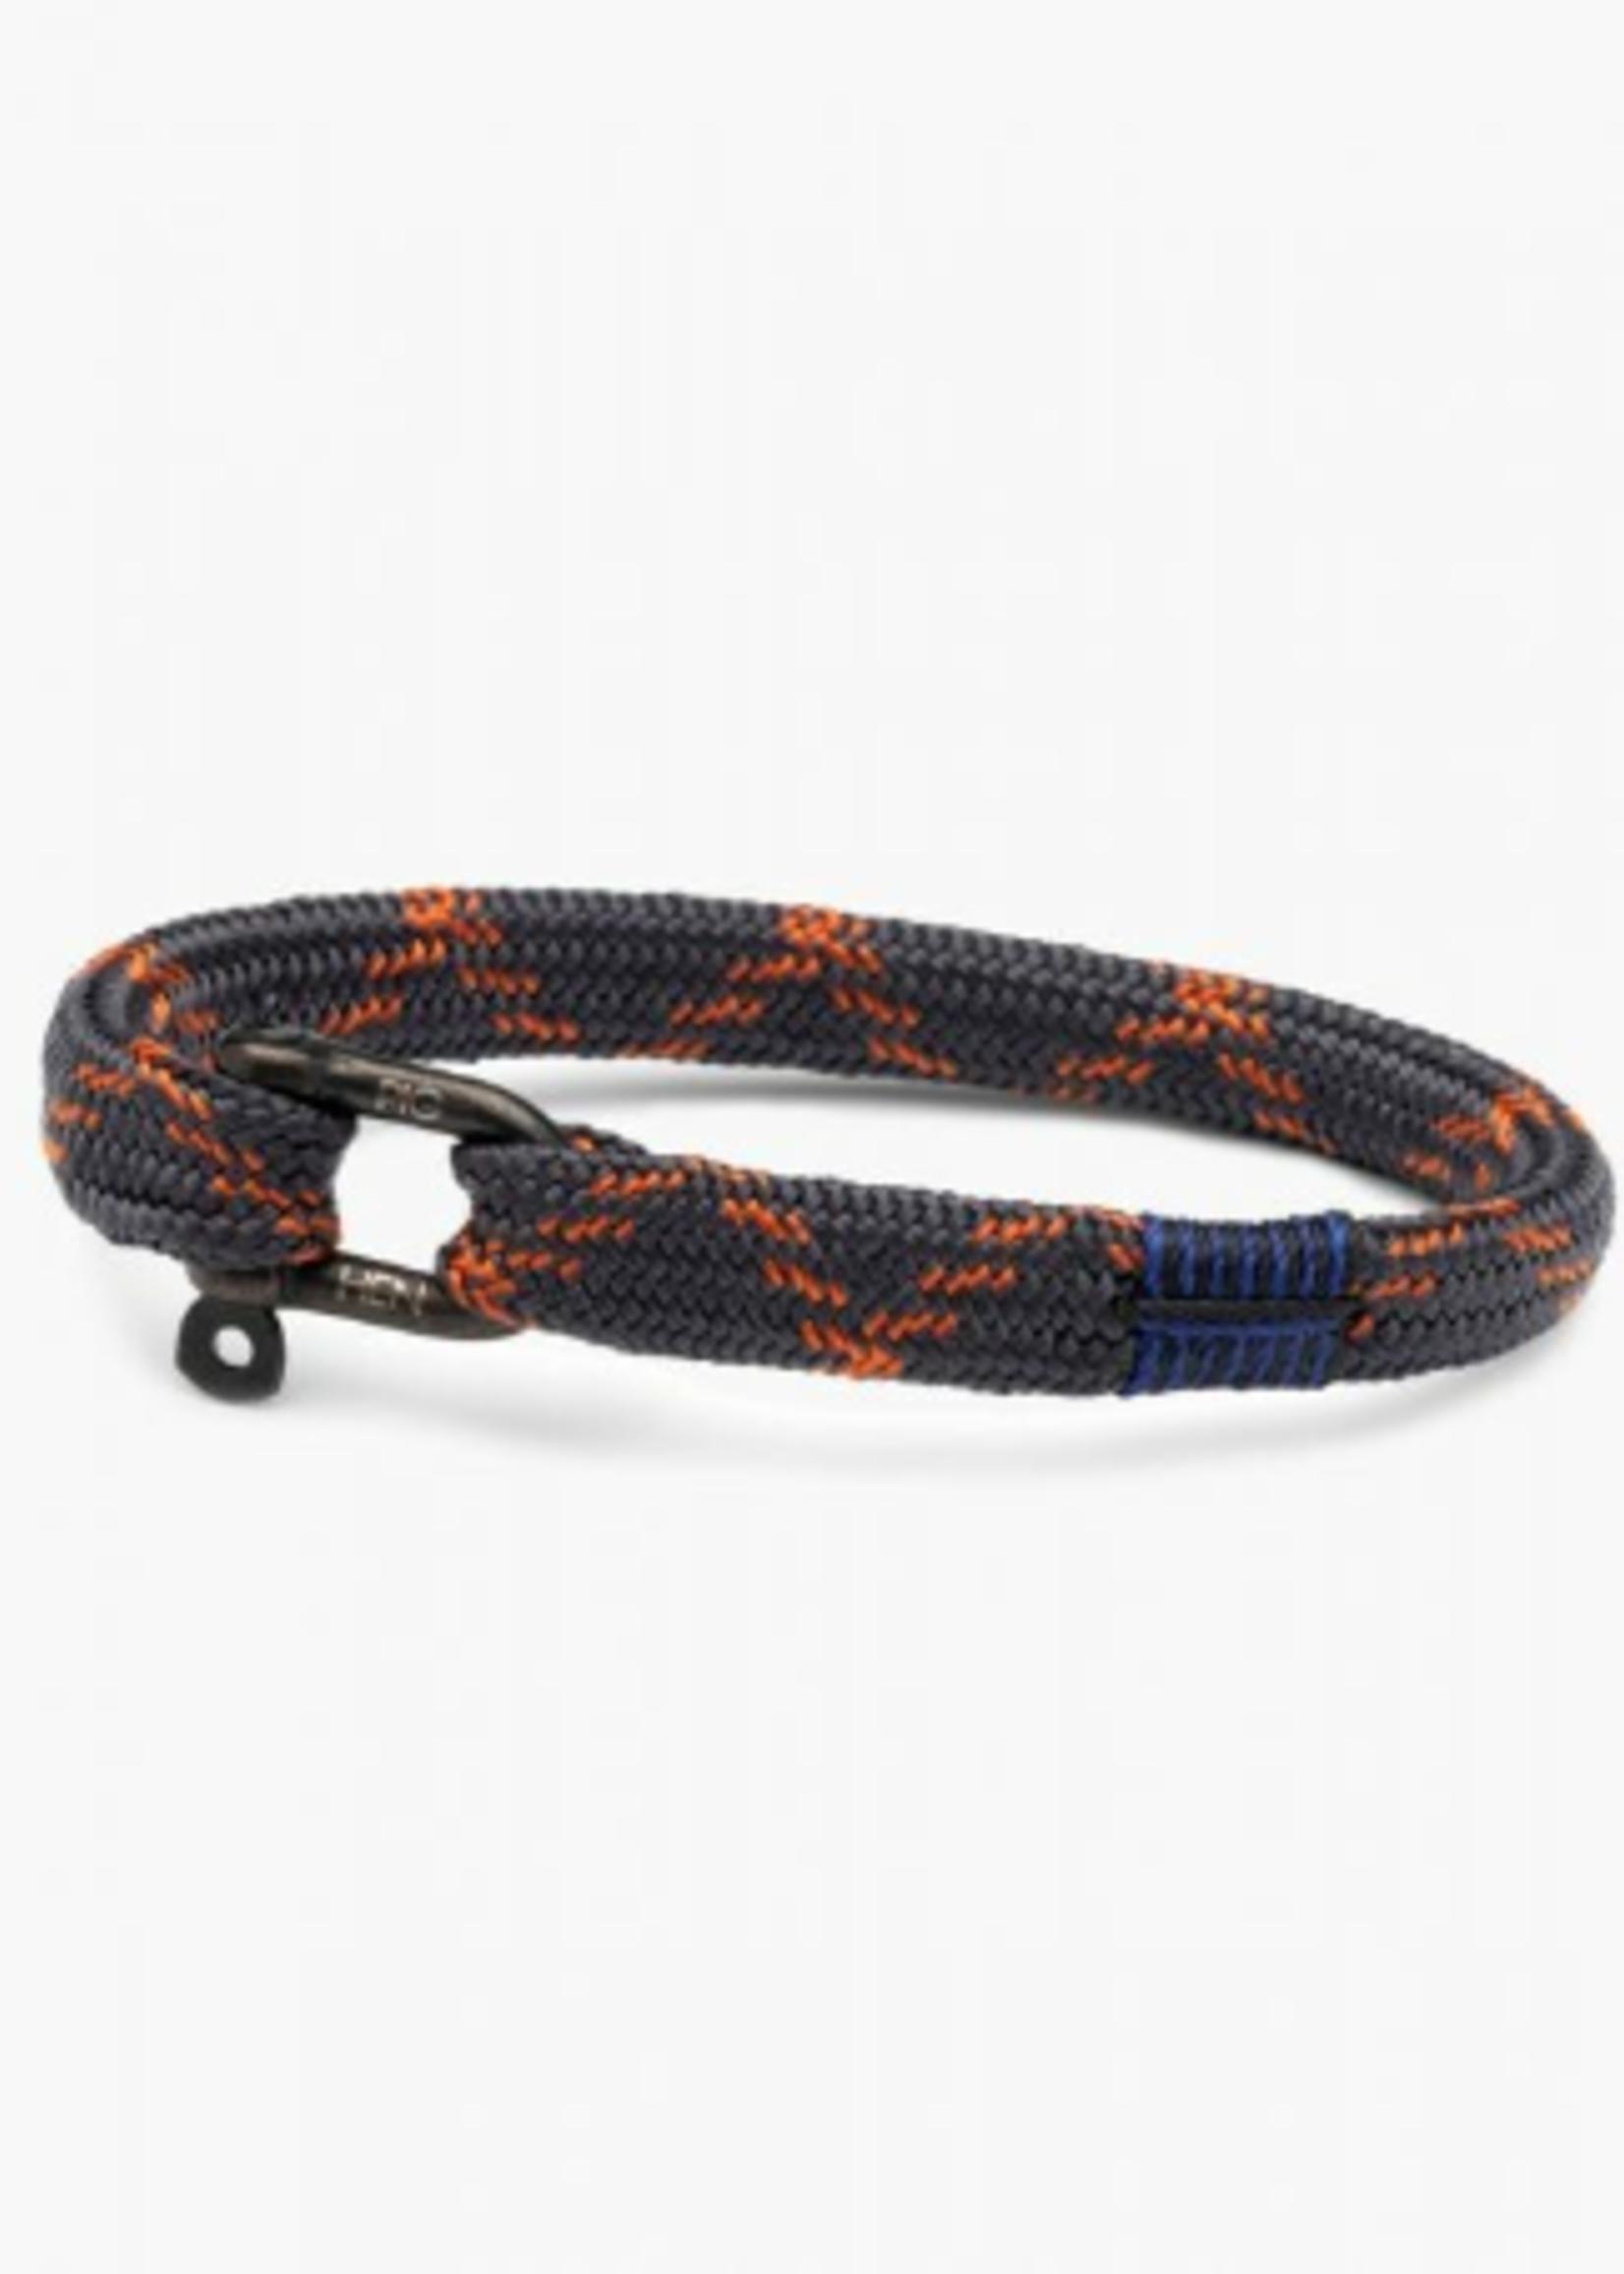 Vicious Vik Slate Gray - Maple Orange | Black